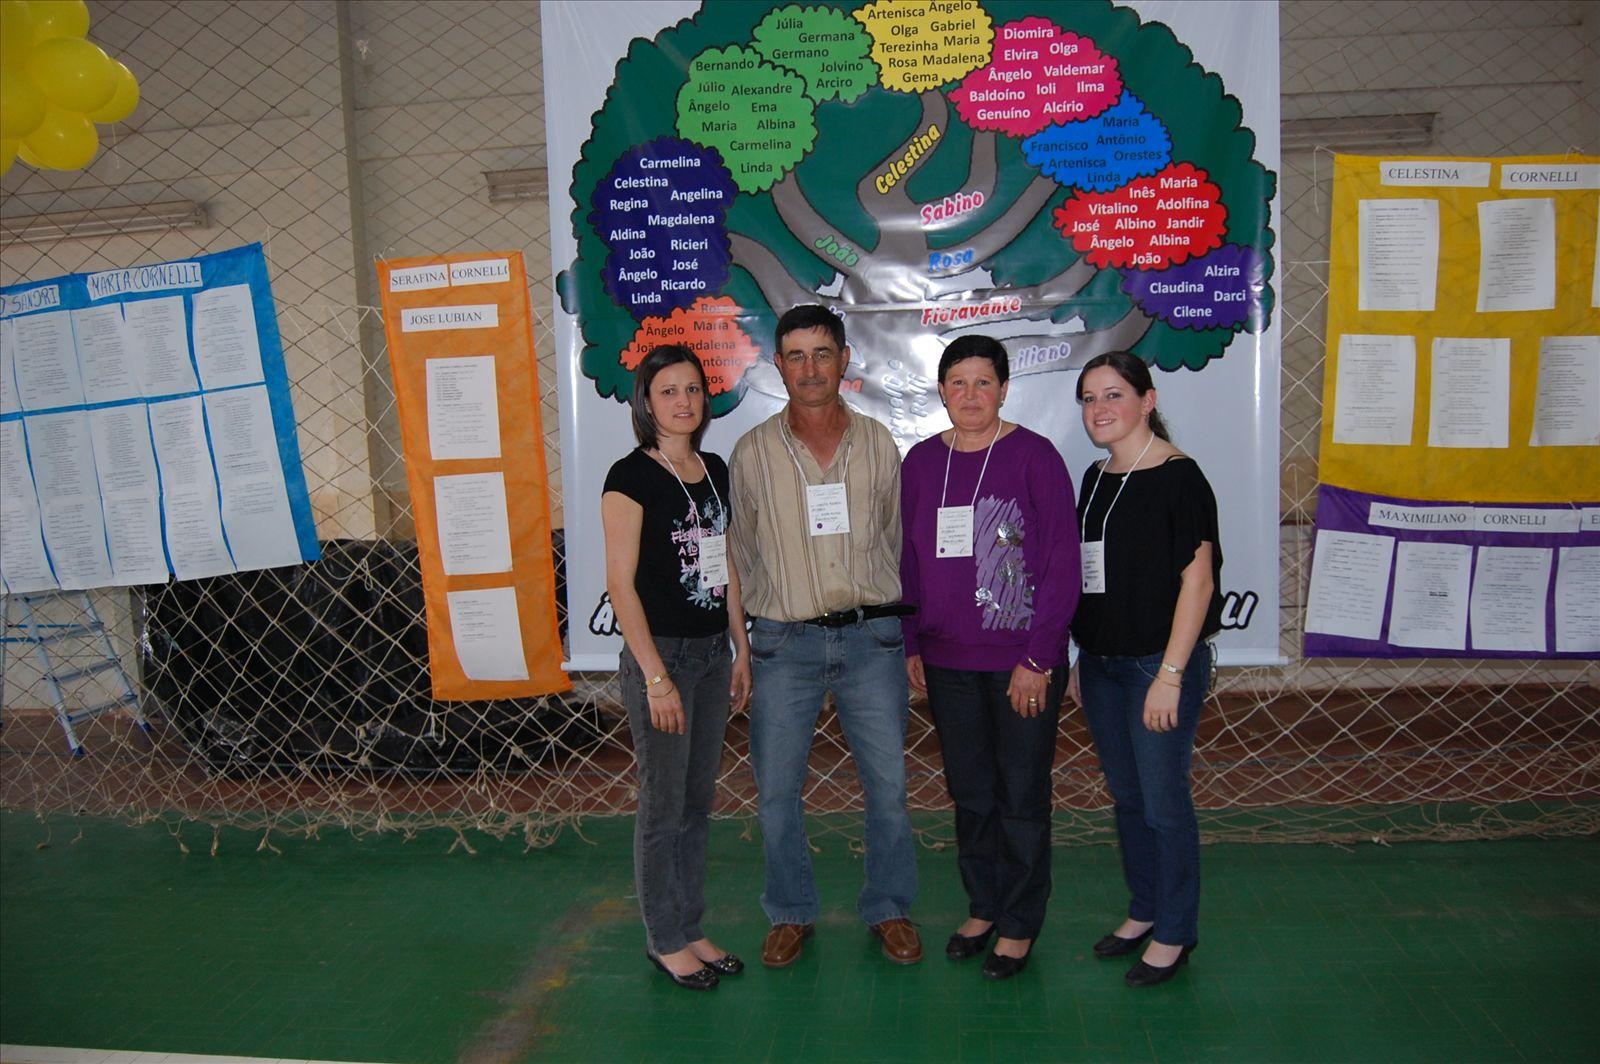 2º Encontro Família Cornelli - 11.10.2009 (223)_0